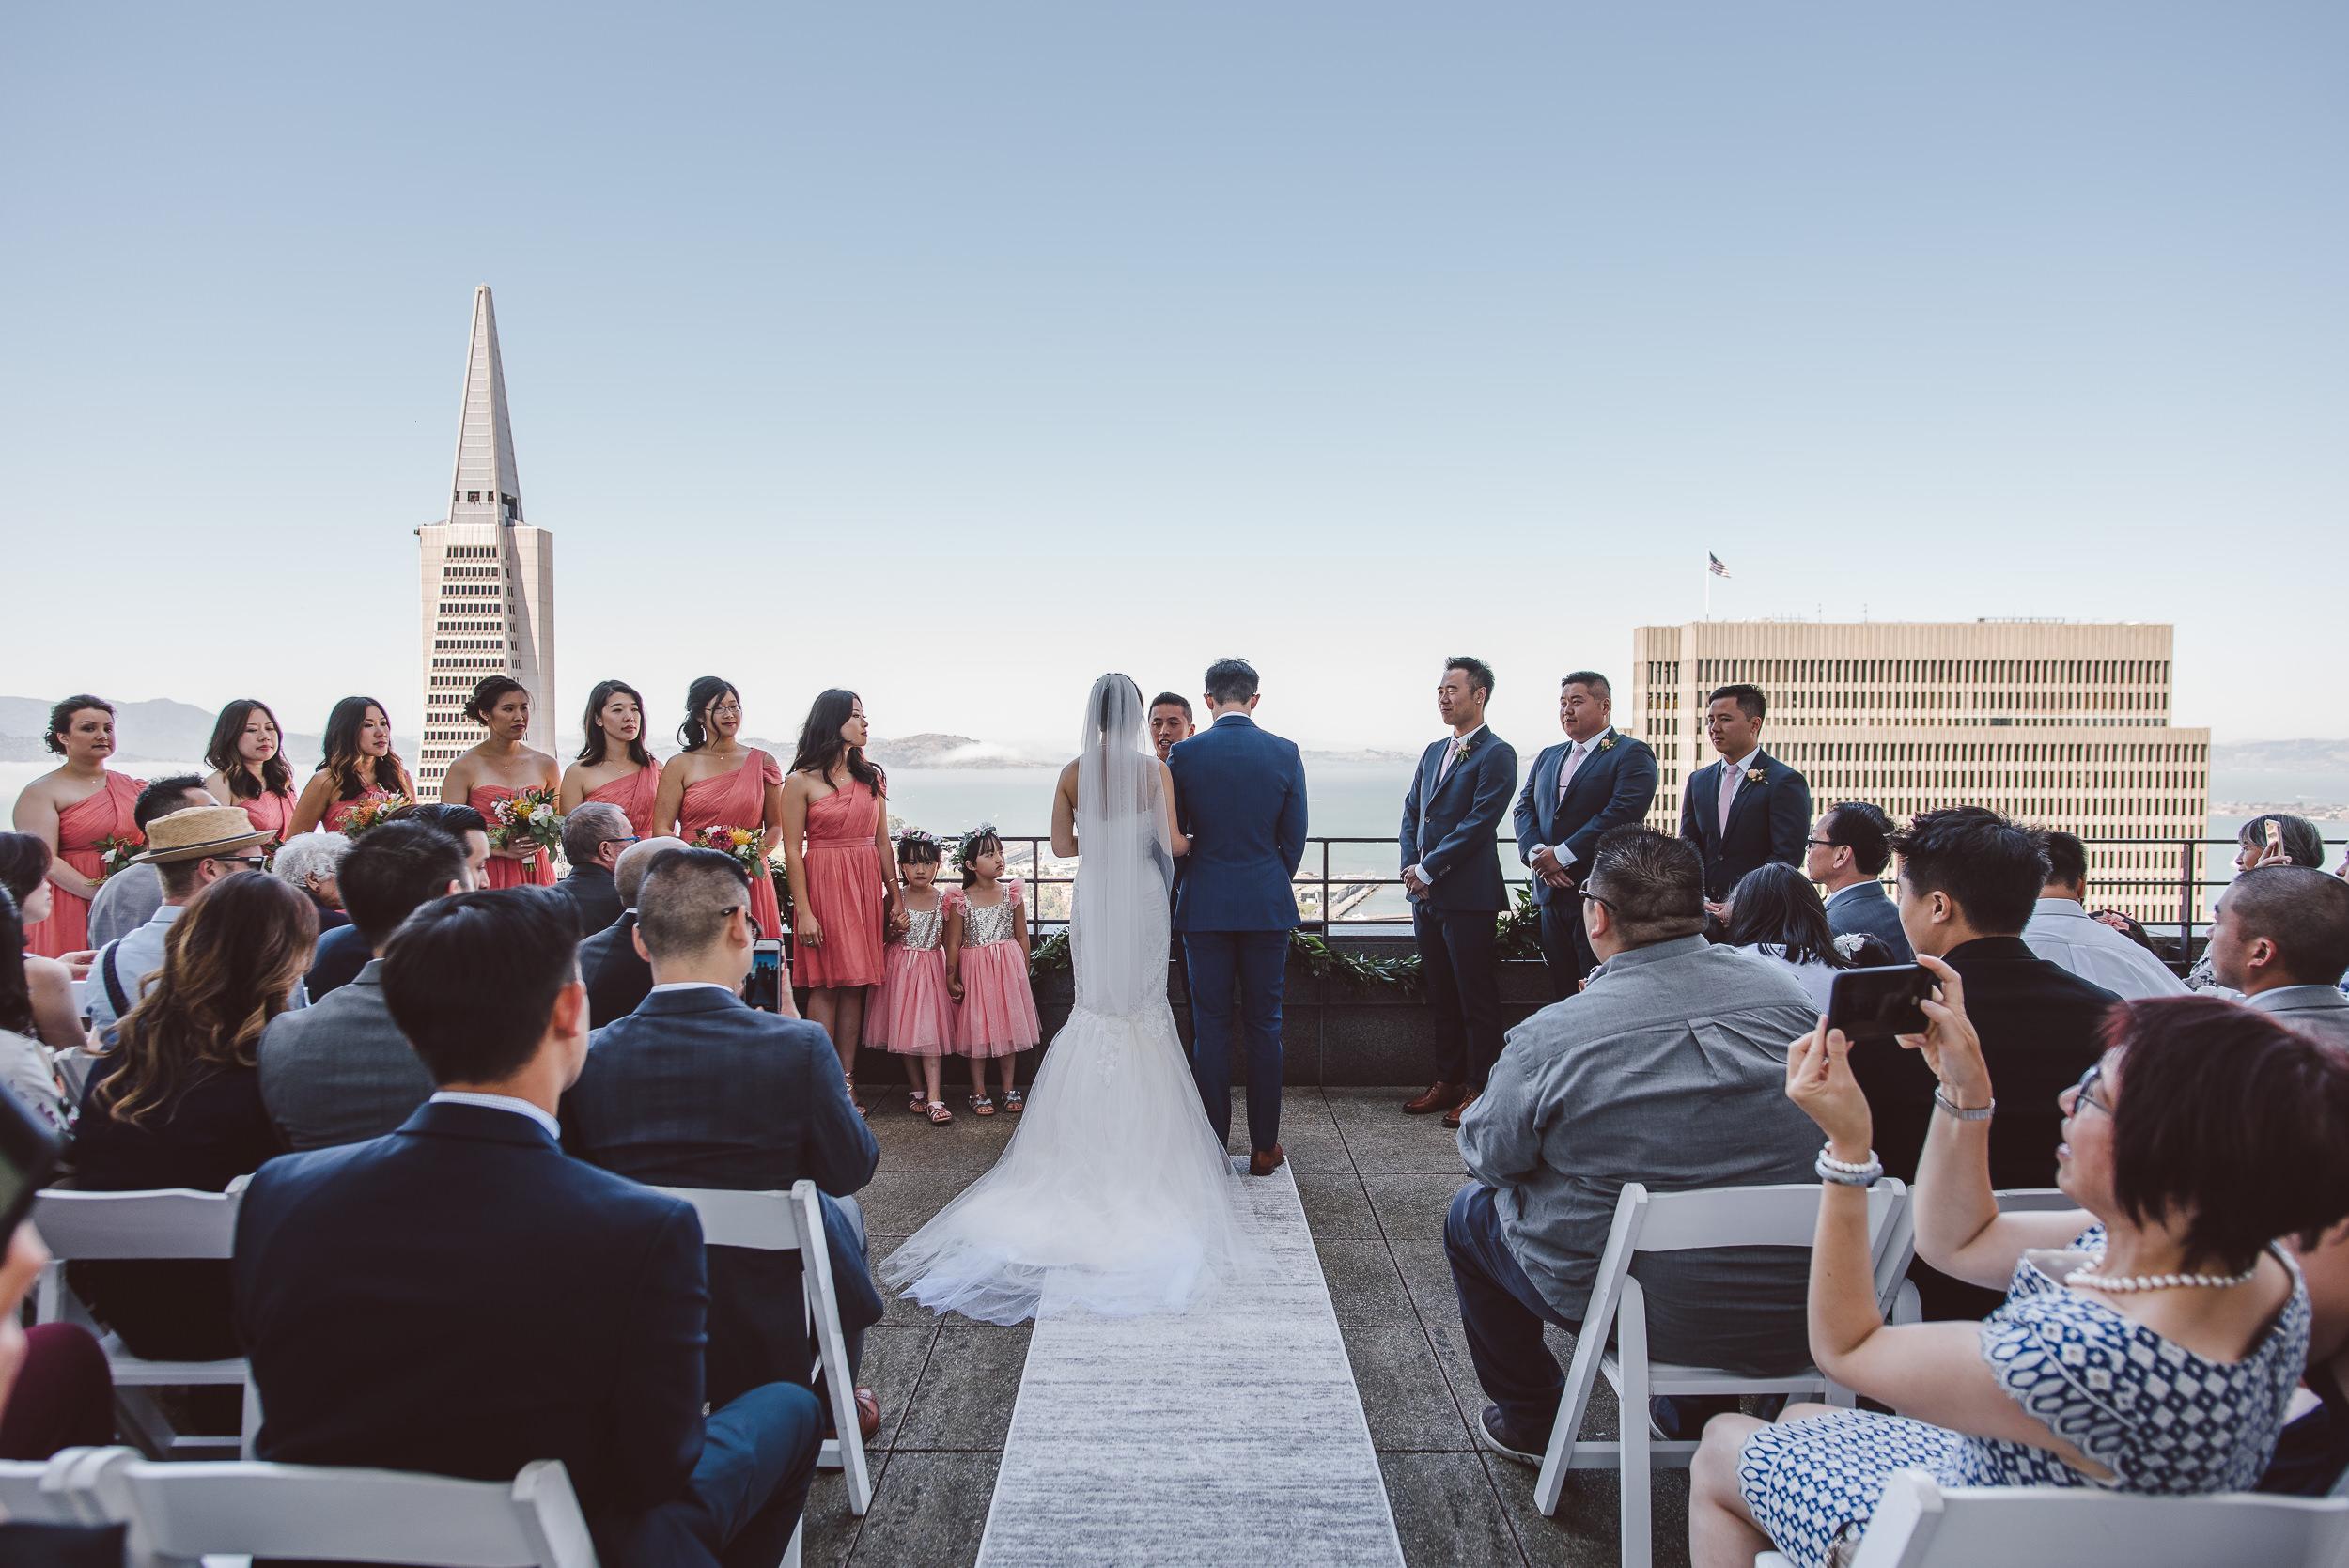 Loews-Regency-San-Francisco-Wedding-Photography-034.jpg